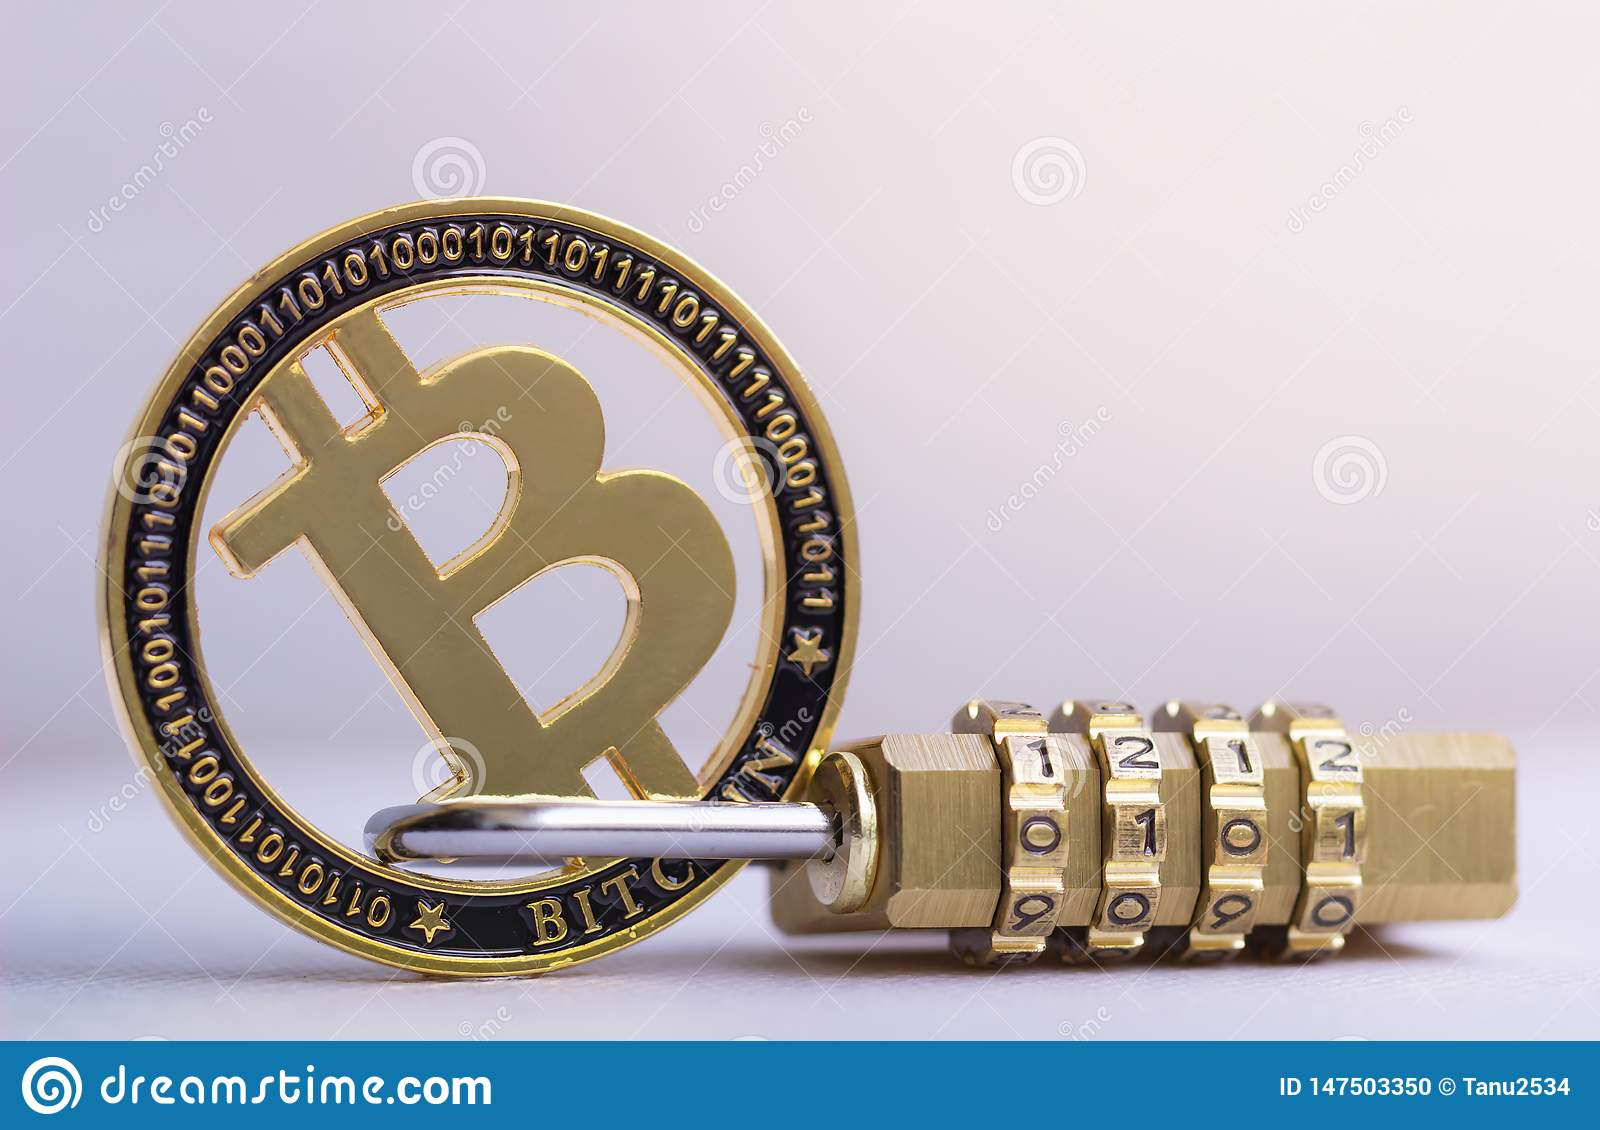 Bitcoin z?ocista moneta z k??dki lying on the beach na bia?ym tle Bitcoin ochrona